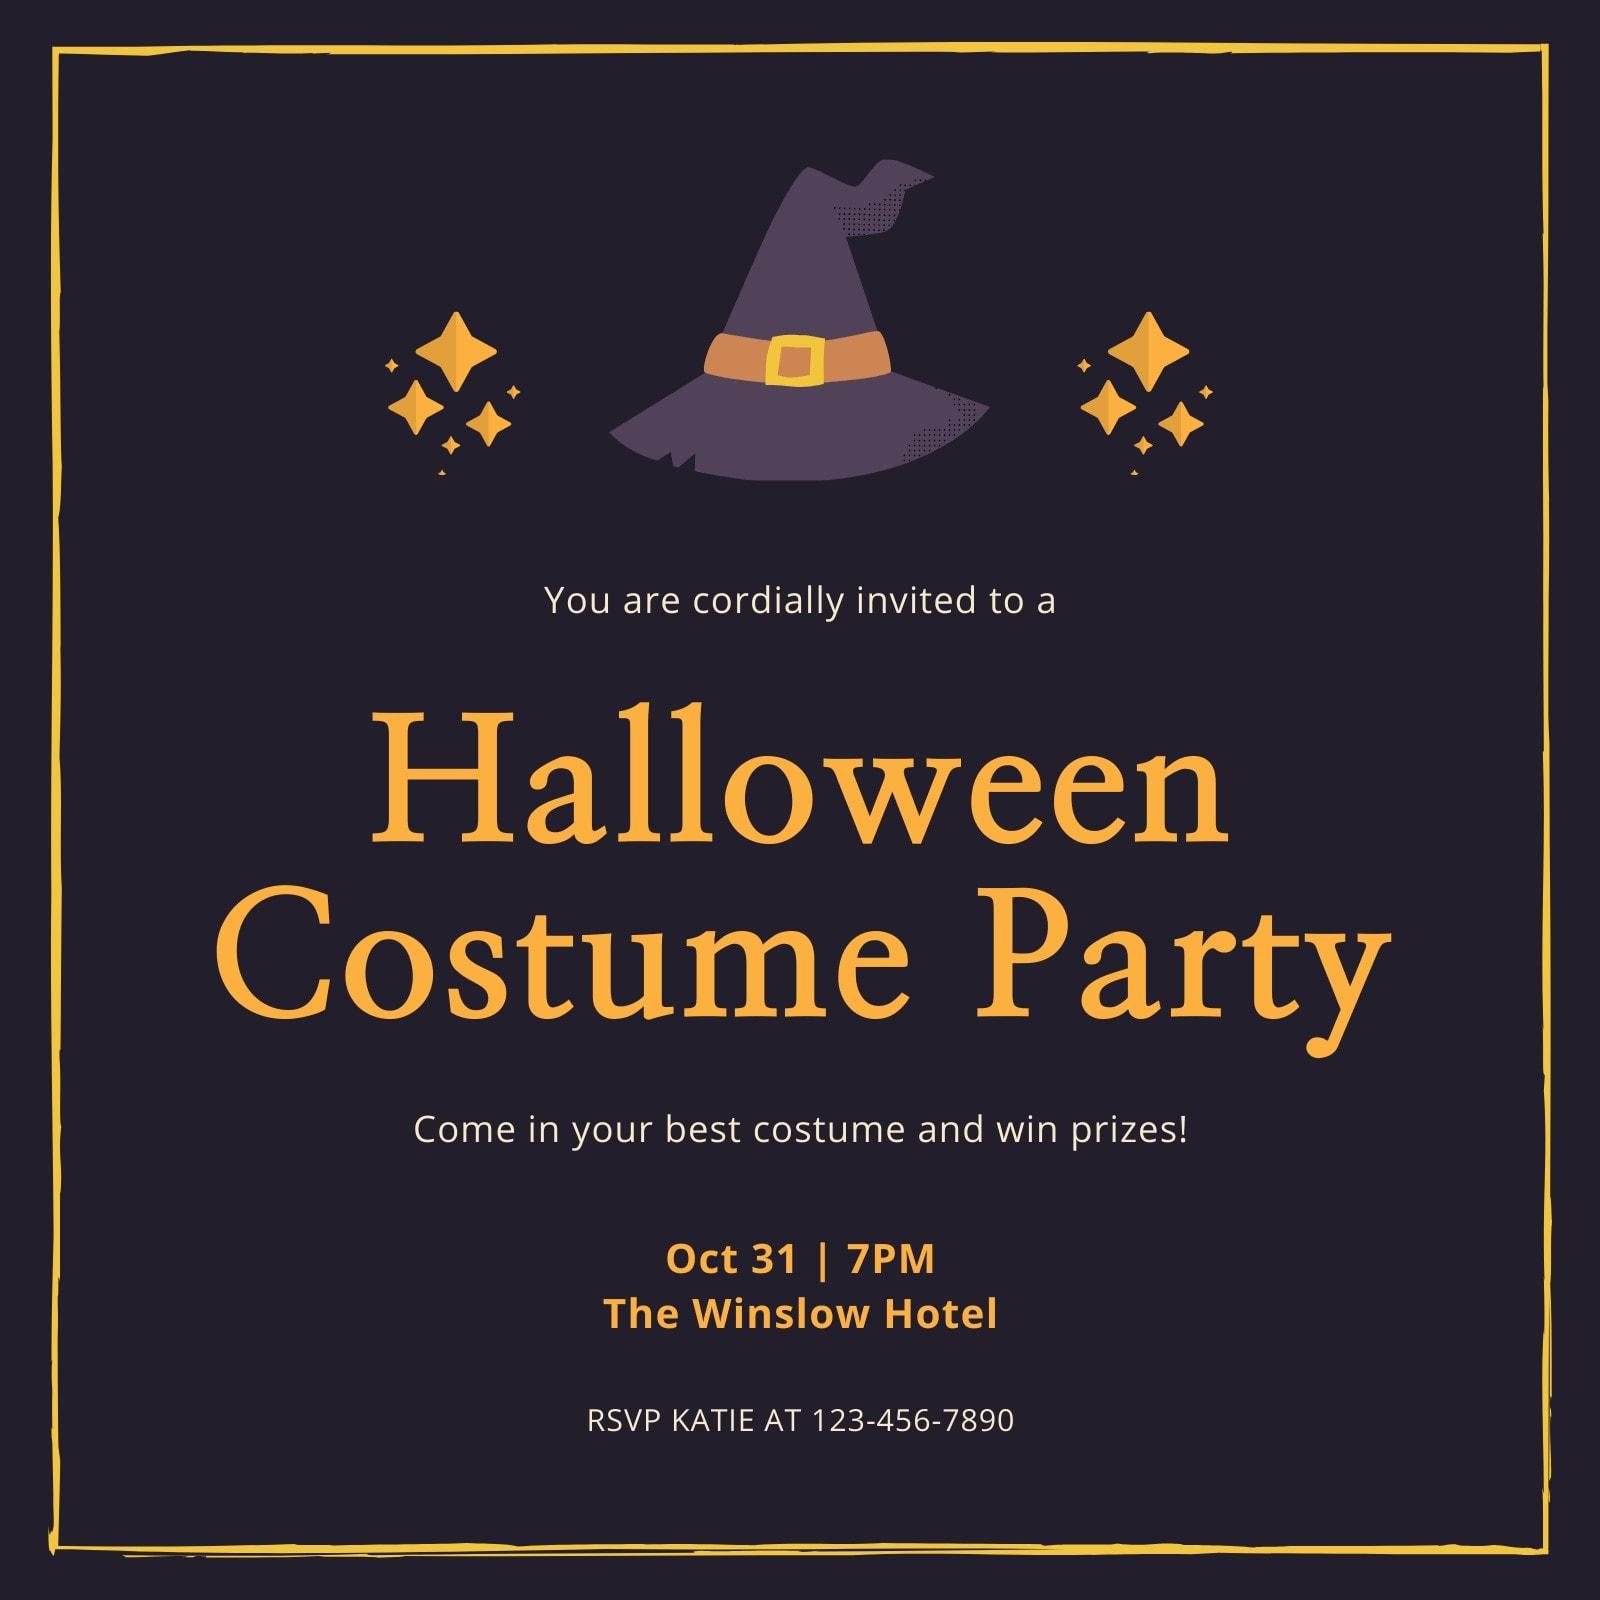 Purple and Orange Bordered Halloween Costume Party Invitation